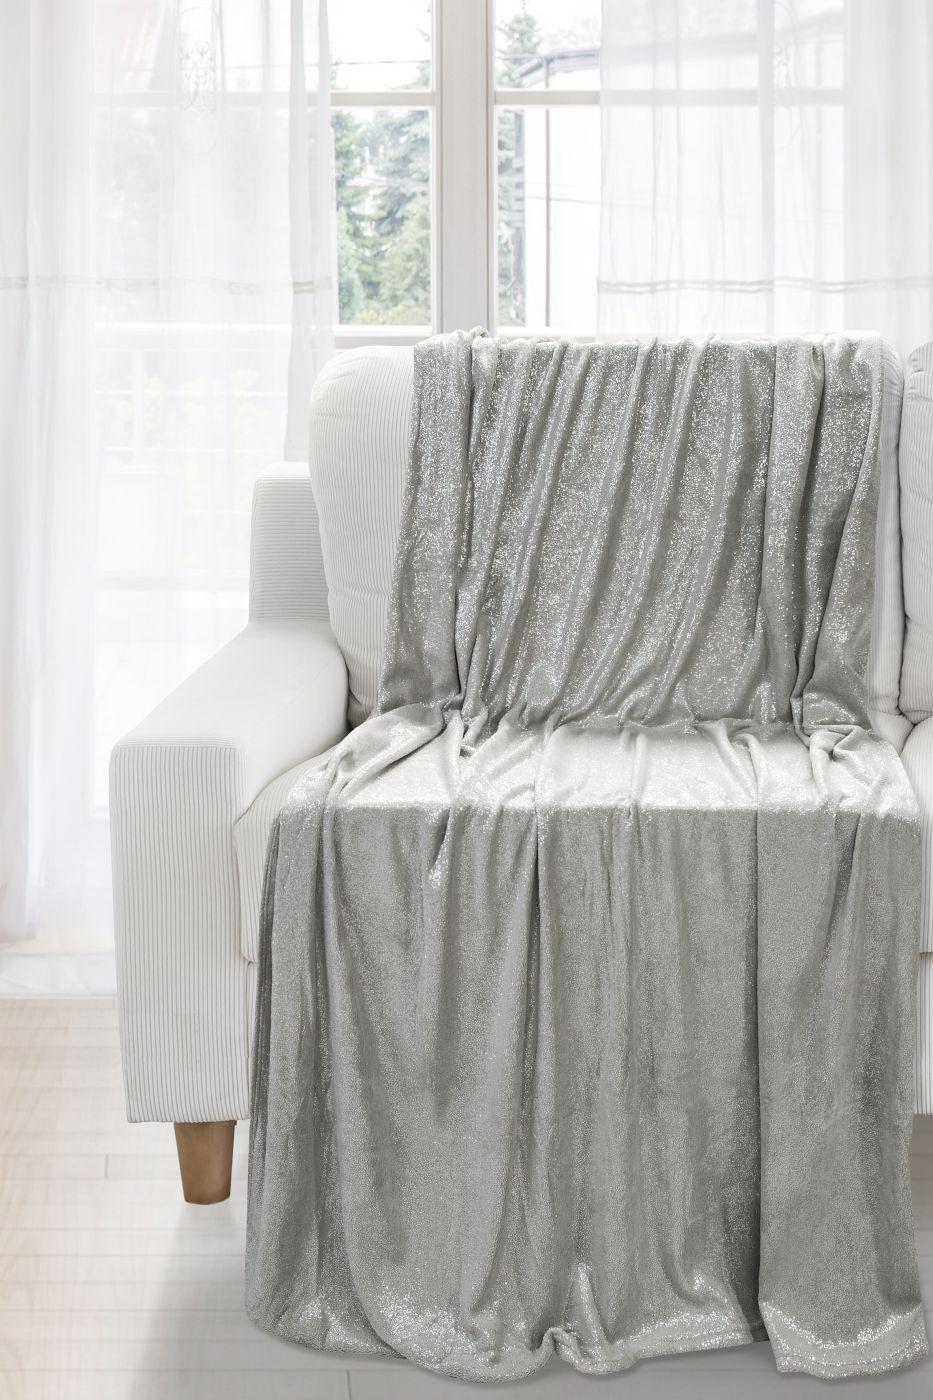 Patura Daisy Grey / Silver 150 x 200 cm